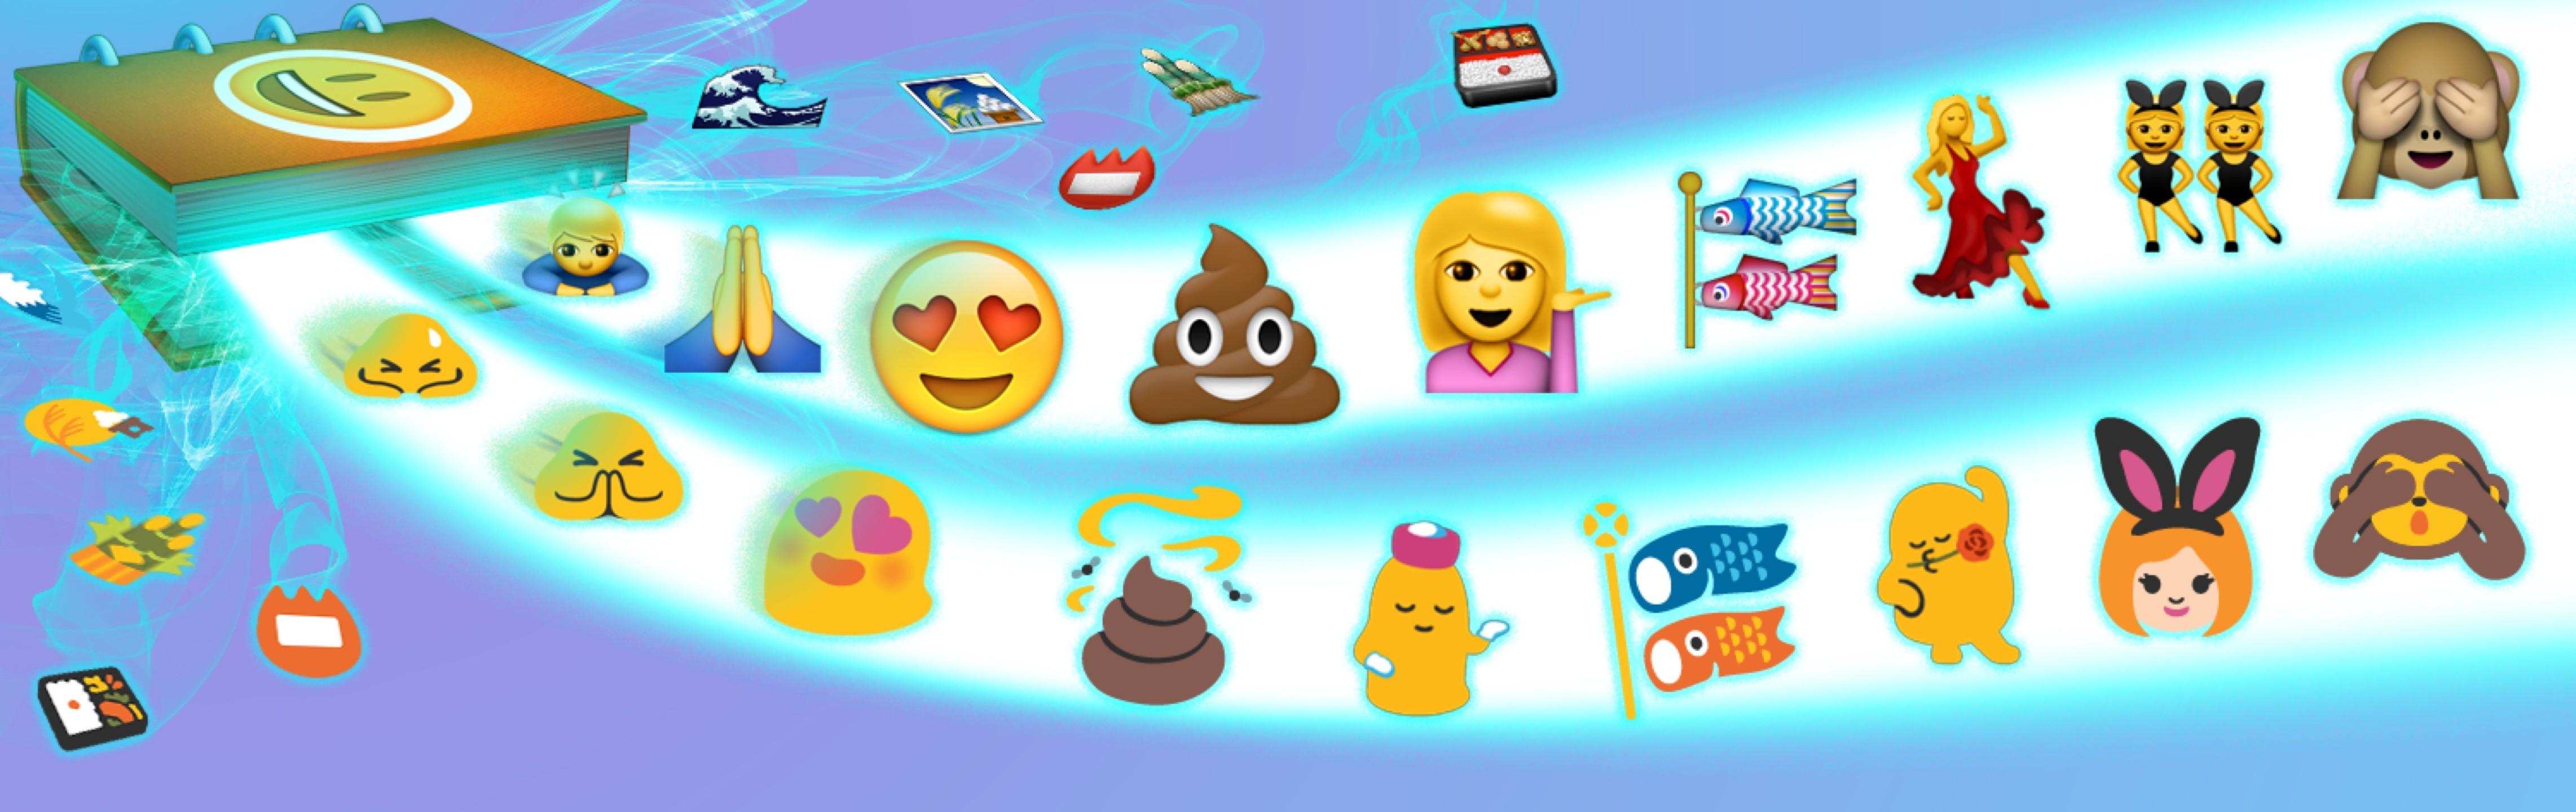 Emojipedia Linkedin